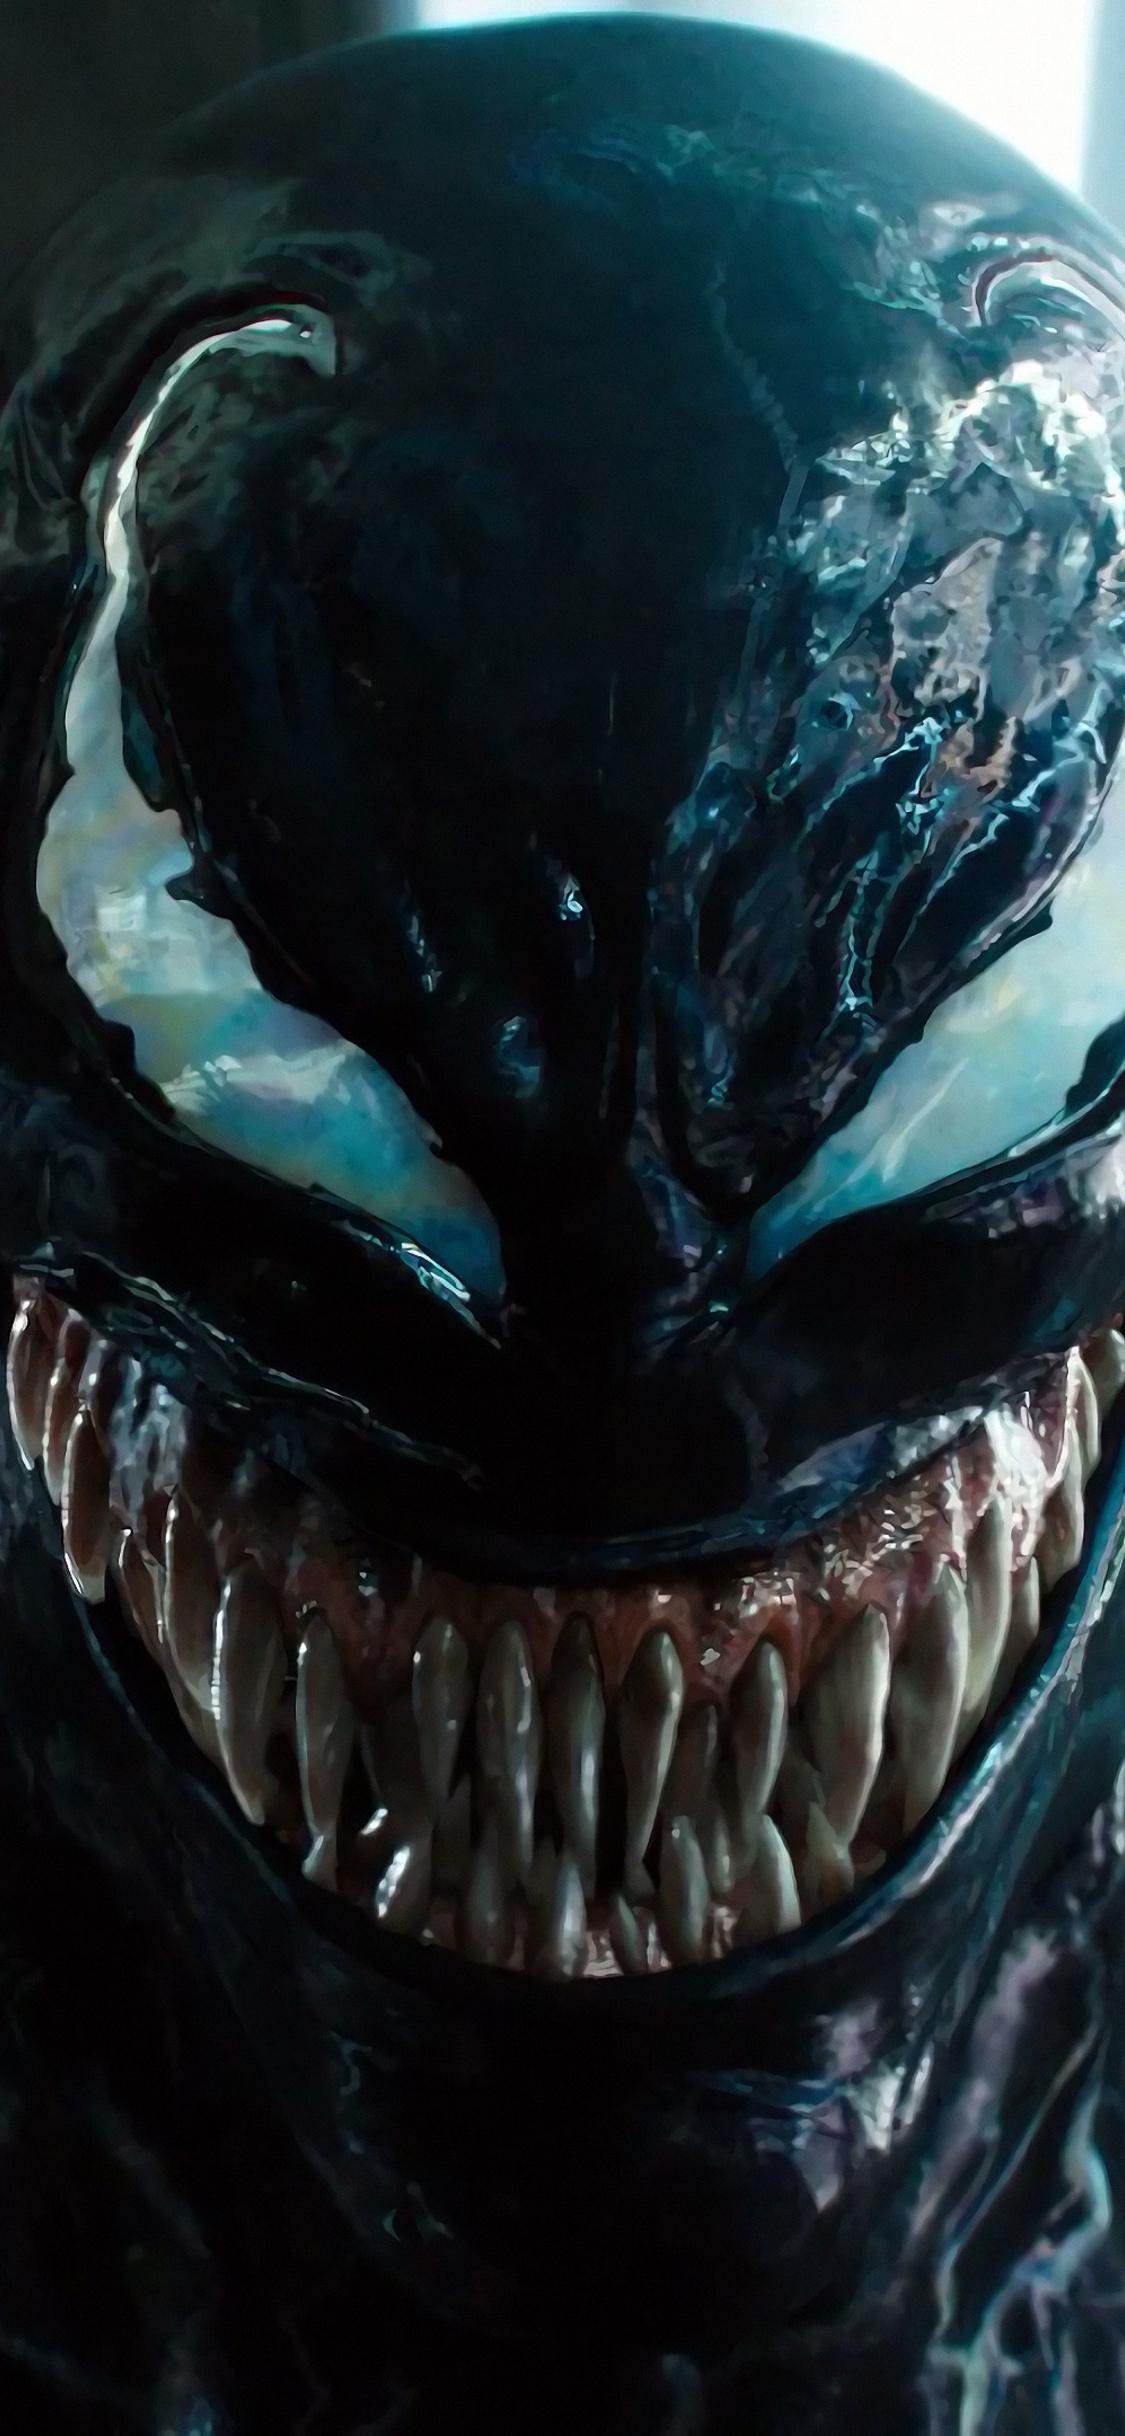 1125x2436 Venom 2018 Movie 4k Iphone XS,Iphone 10,Iphone X ...